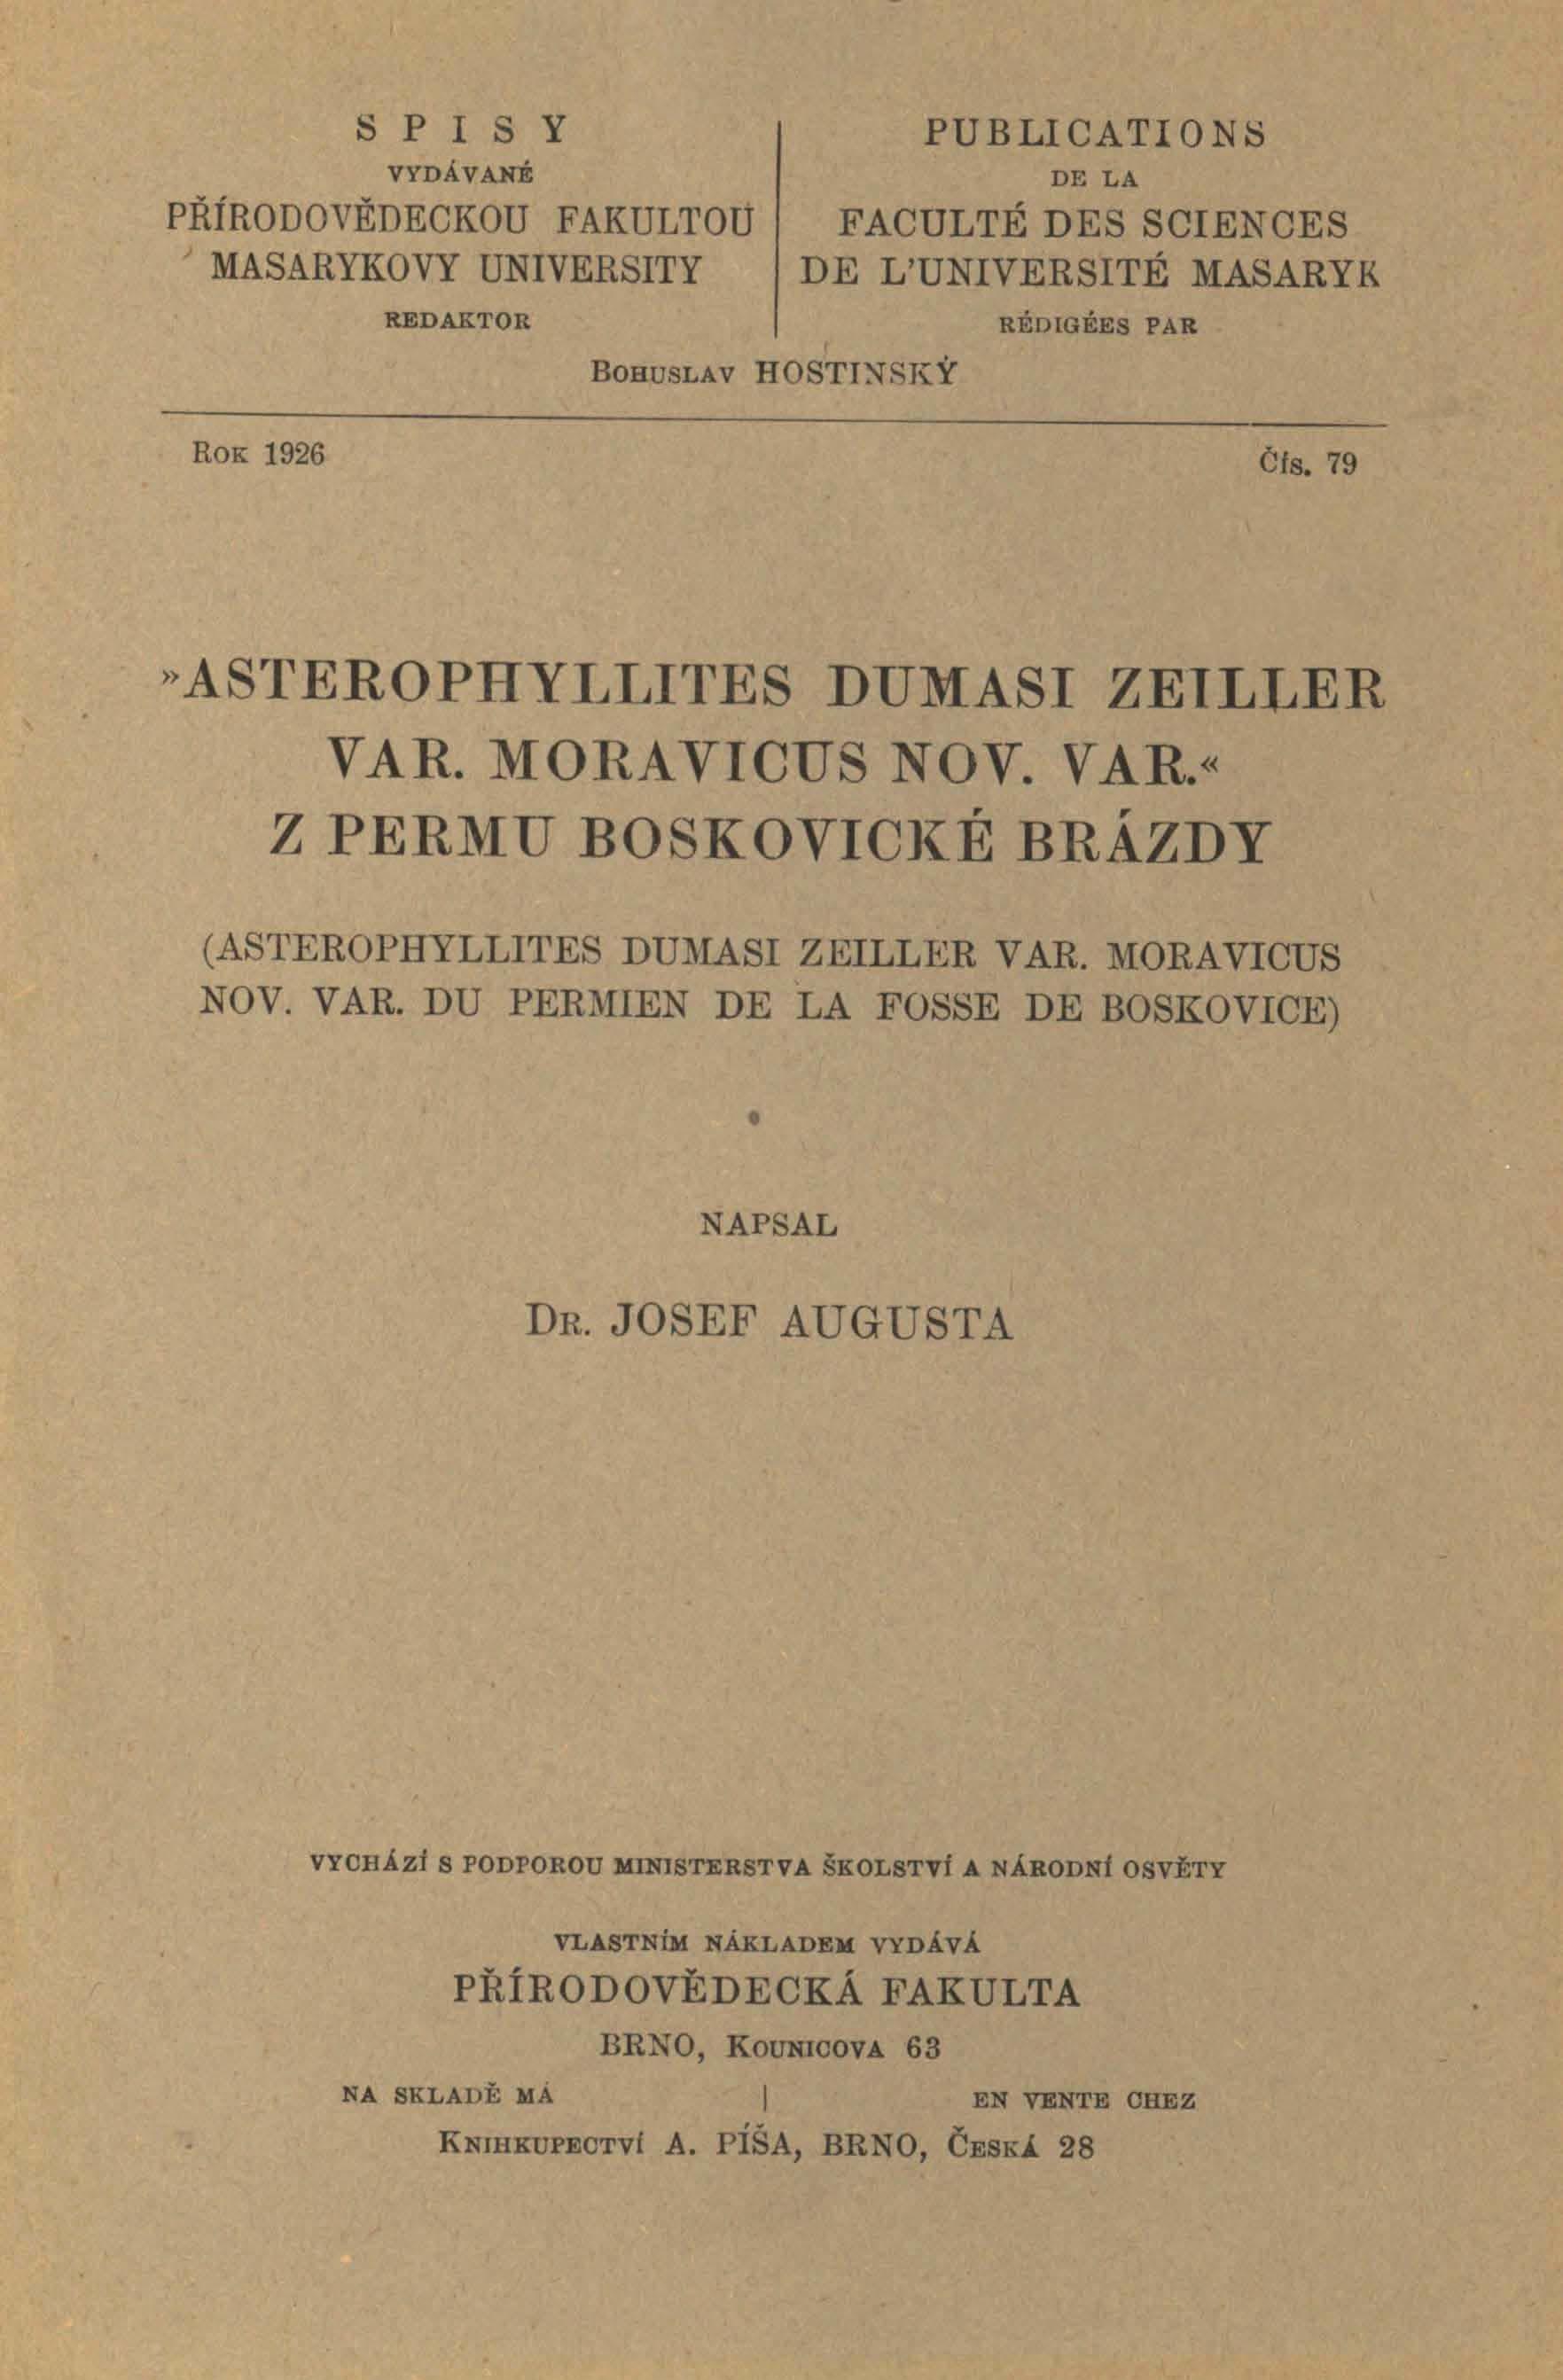 Obálka pro Asterophyllites Dumasi Zeiller var. moravicus nov. var. z permu boskovické brázdy